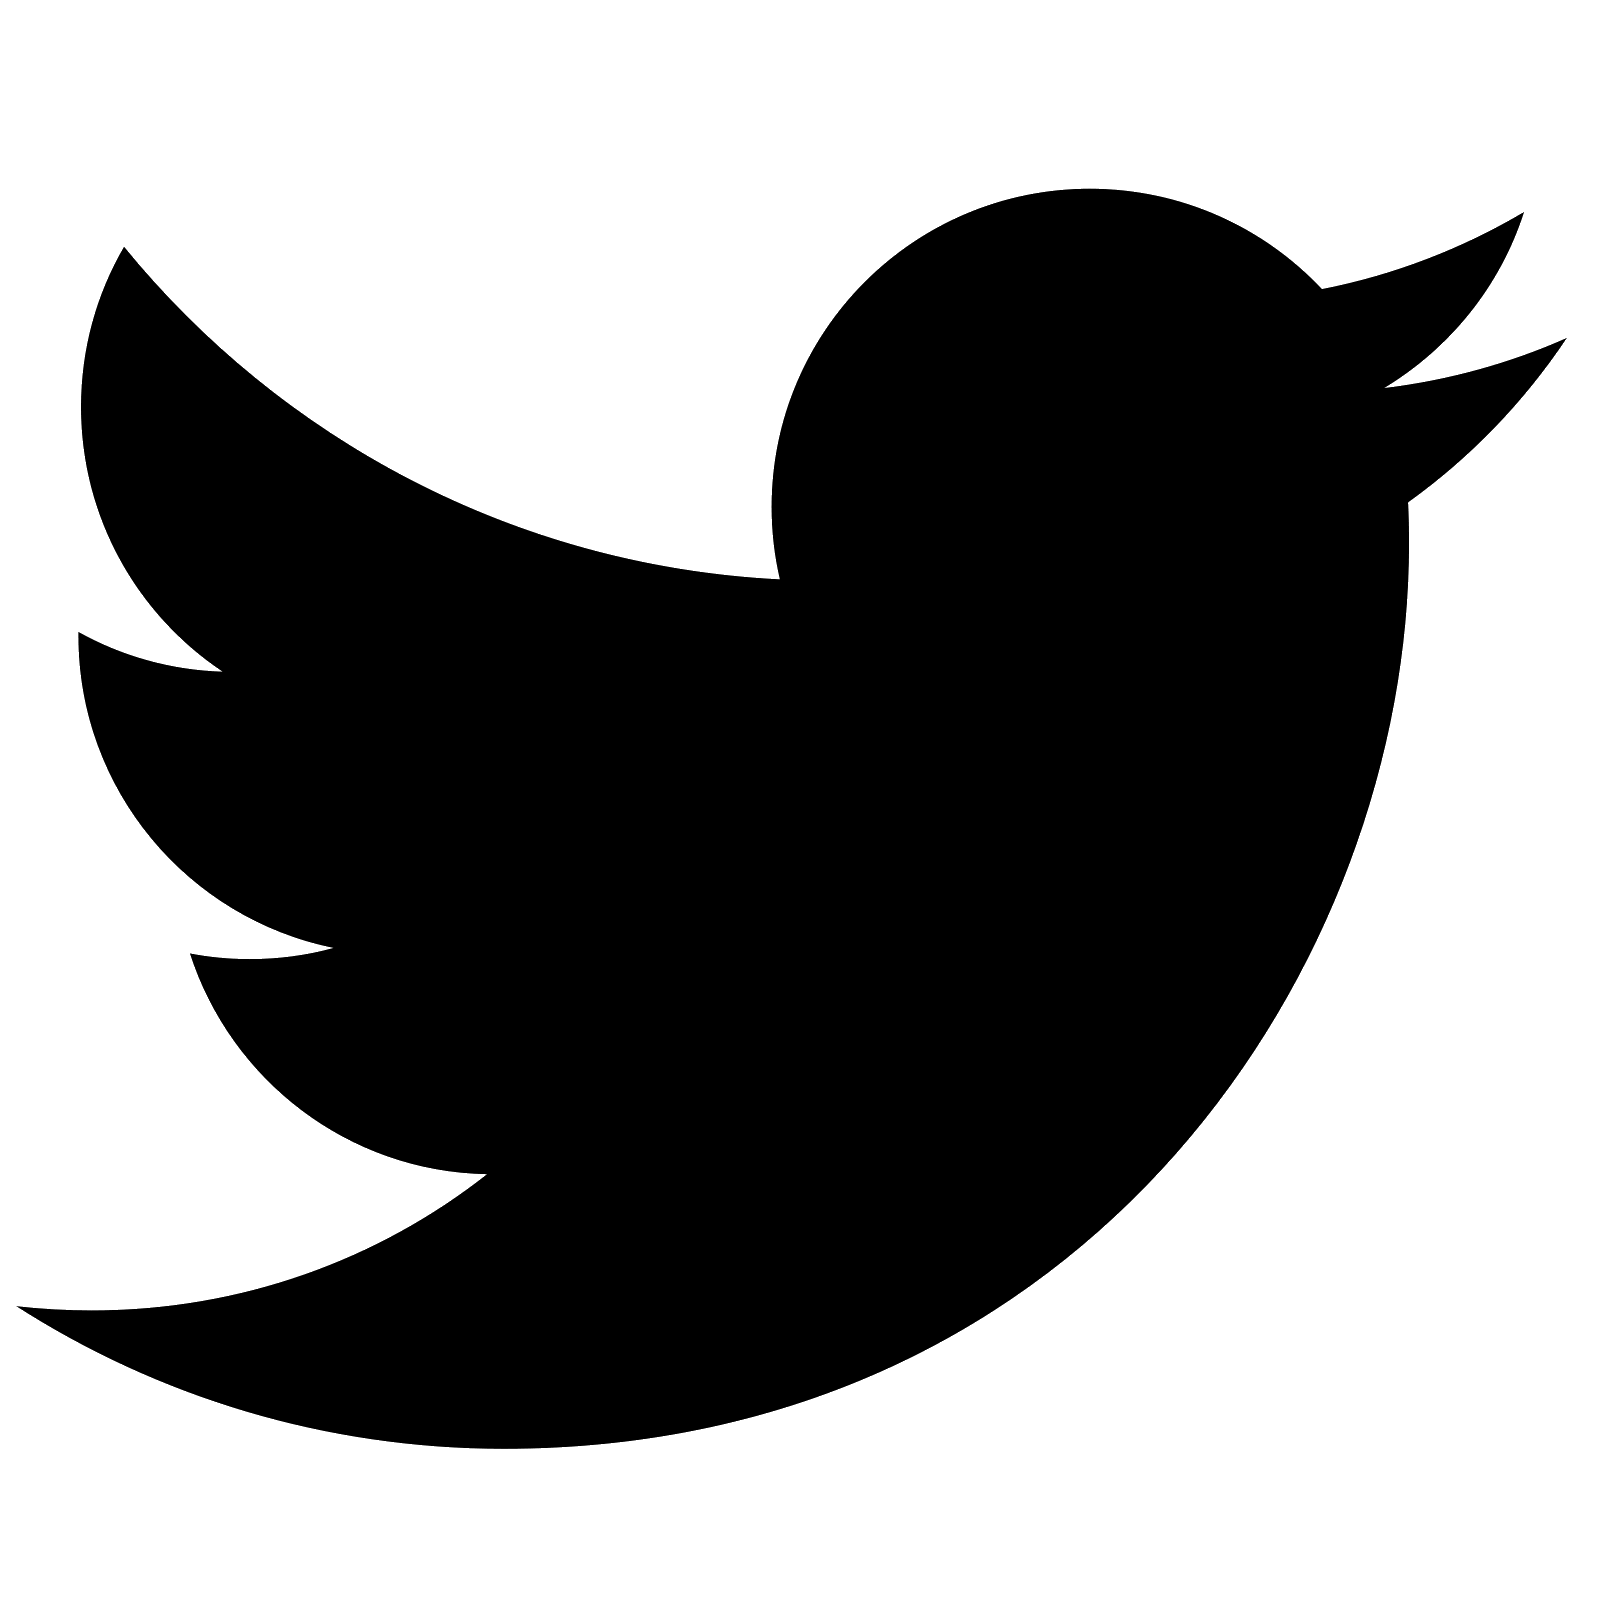 Twitter Logo Png Black.